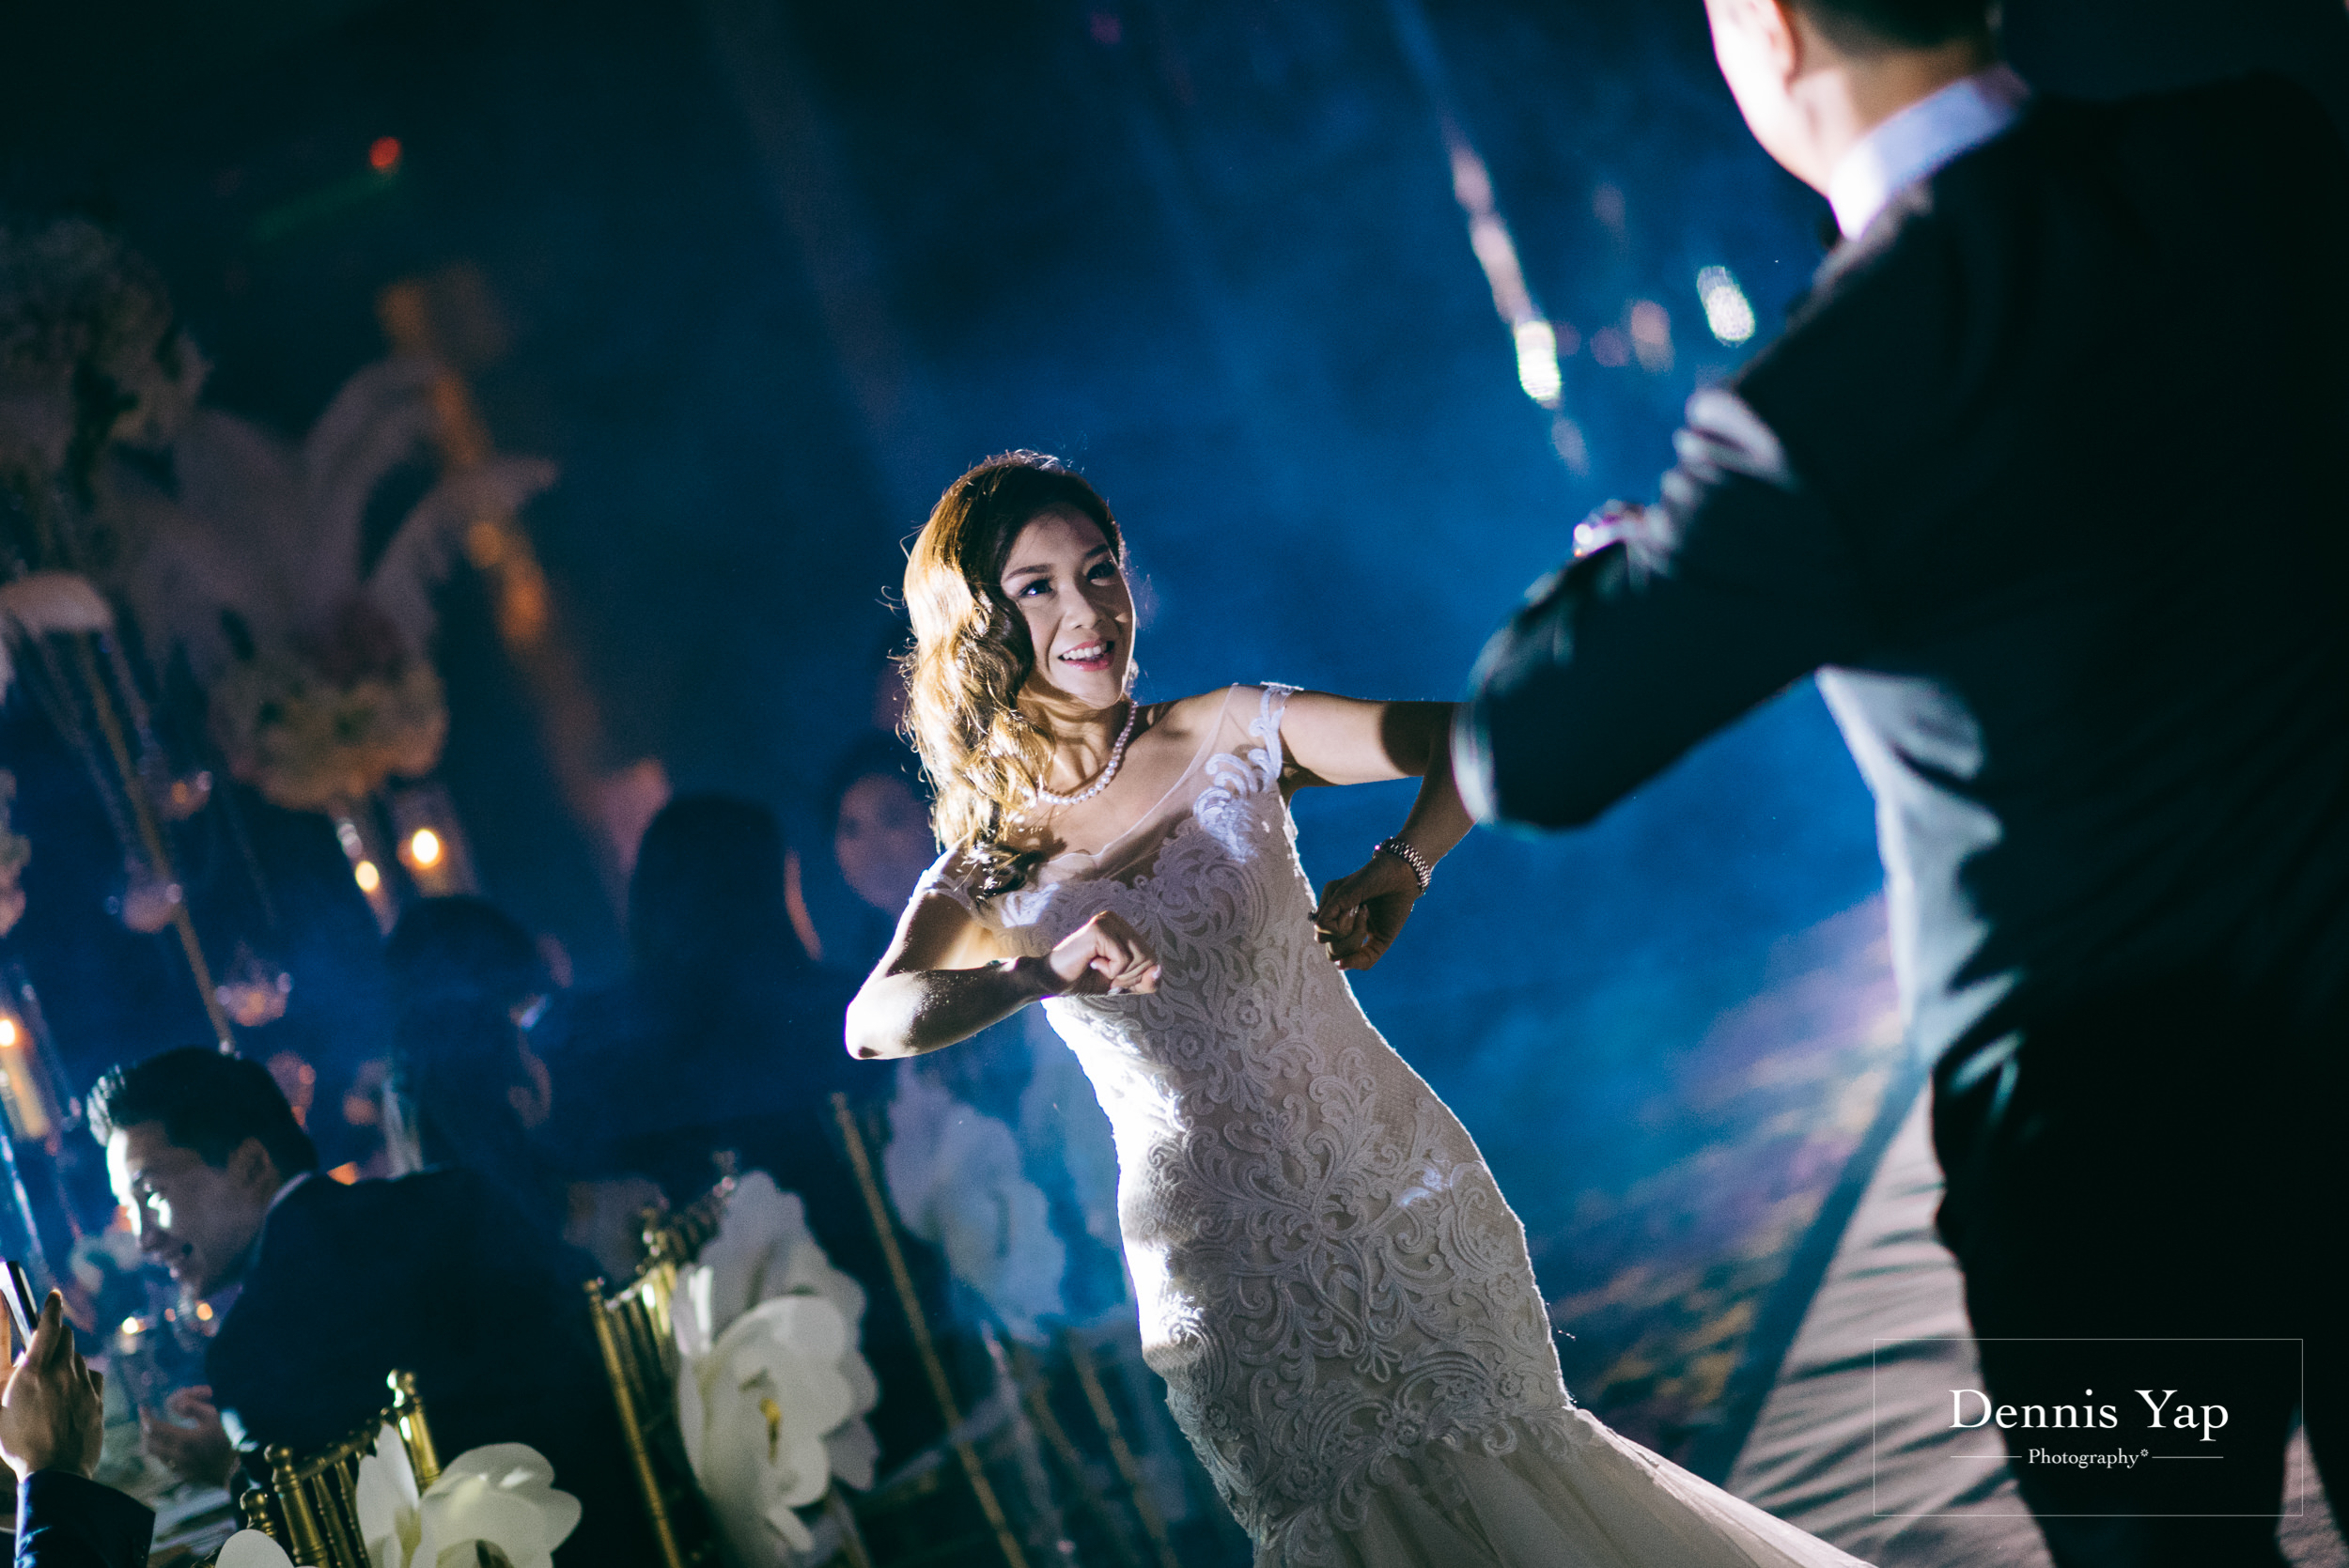 lionel joanne garden wedding majestic hotel dennis yap photography malaysia top wedding photographer-79.jpg